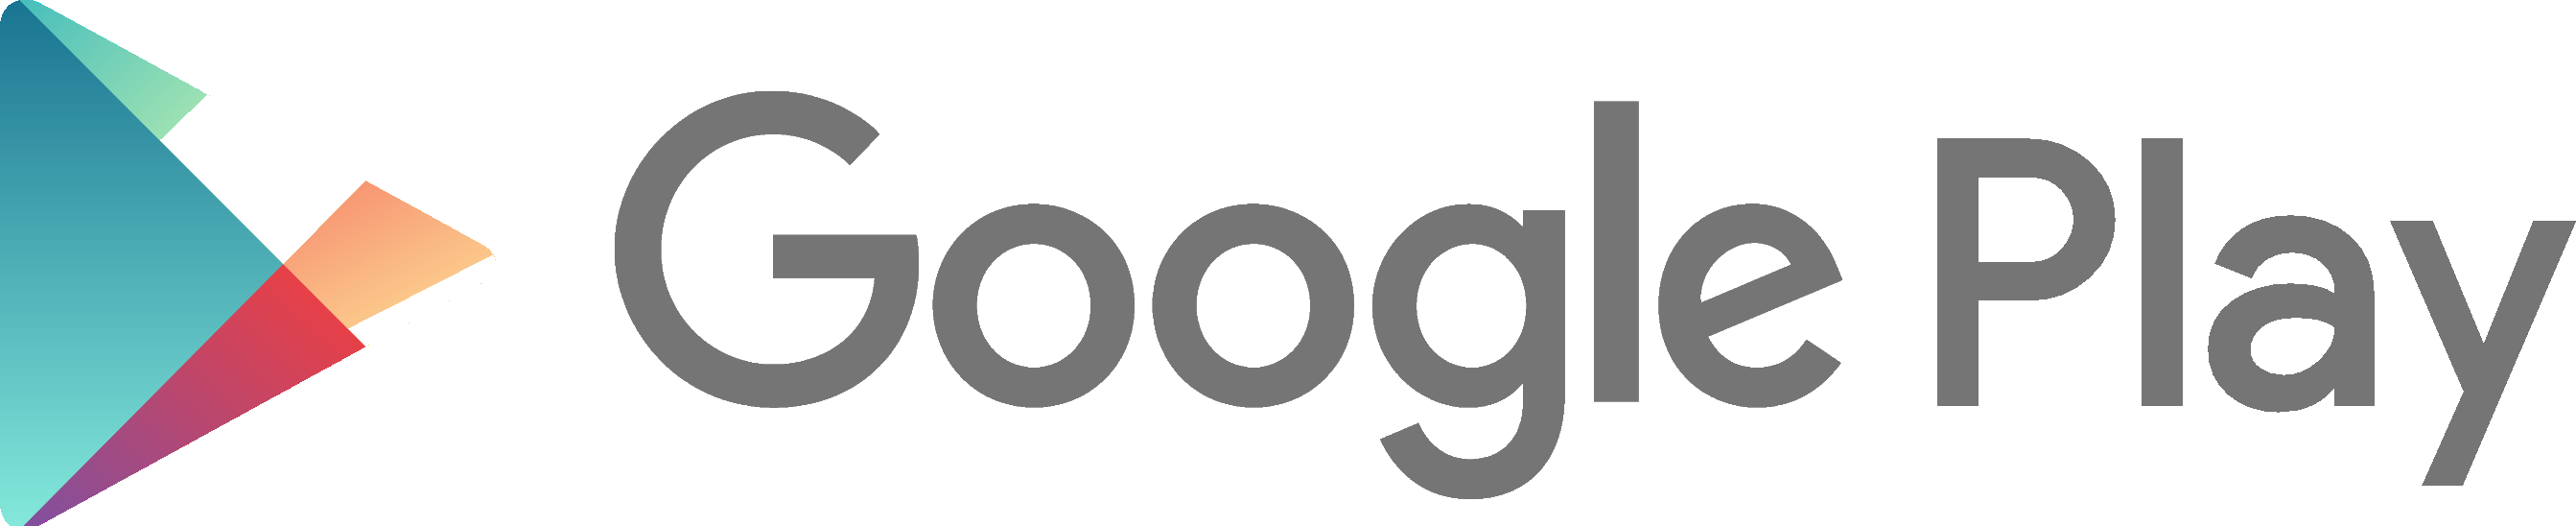 Somfy_Smart_Home_App_Google_Play